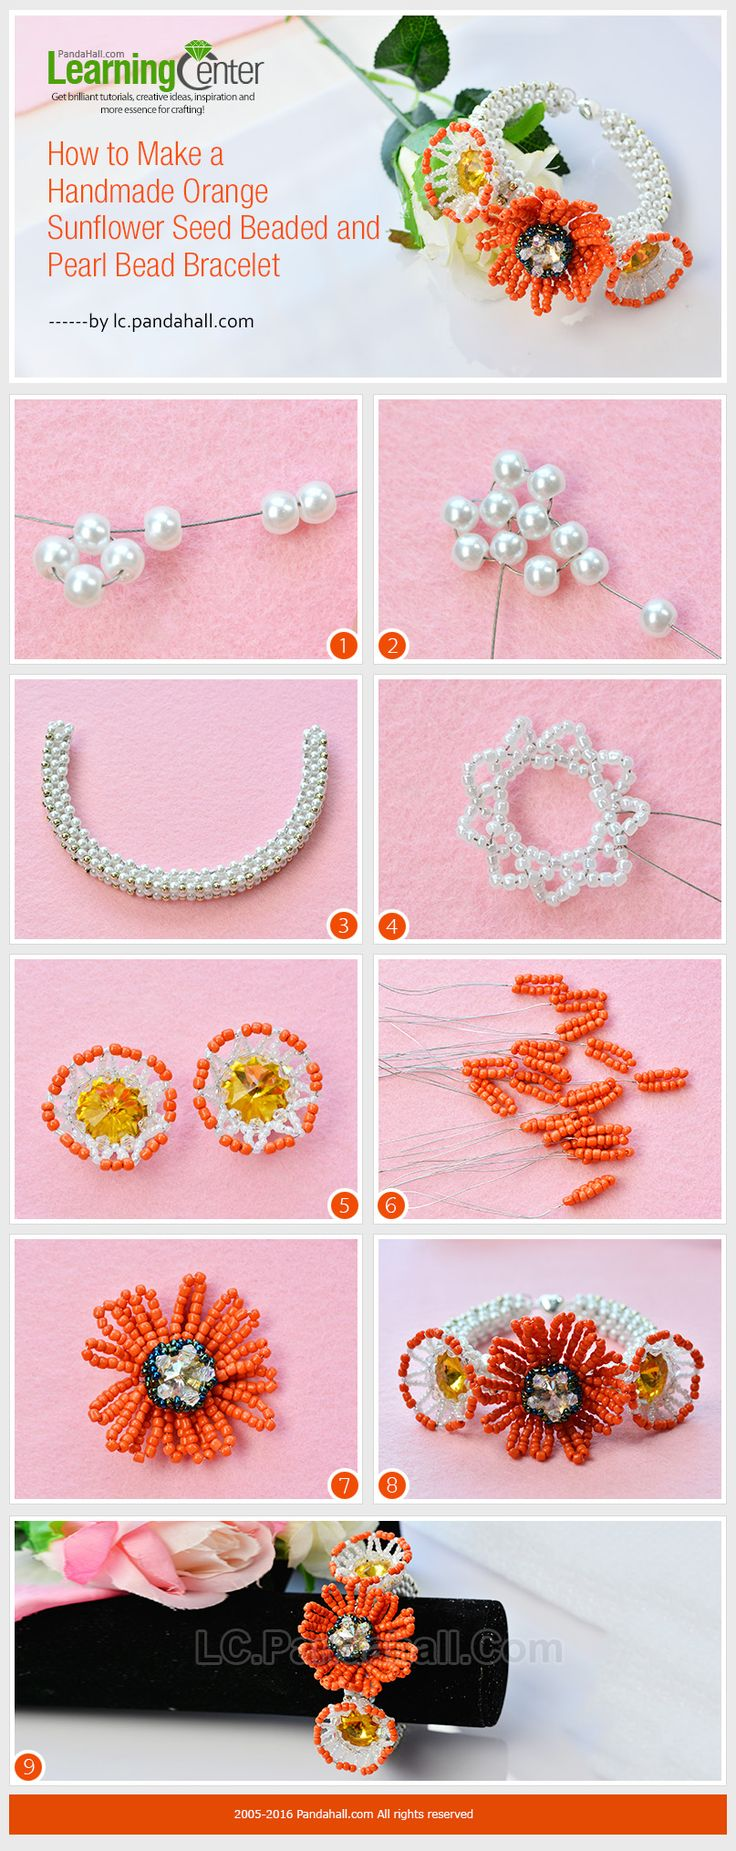 Tutorial on How to Make a Handmade Orange Sunflower Seed Beaded and Pearl Bead Bracelet from LC.Pandahall.com